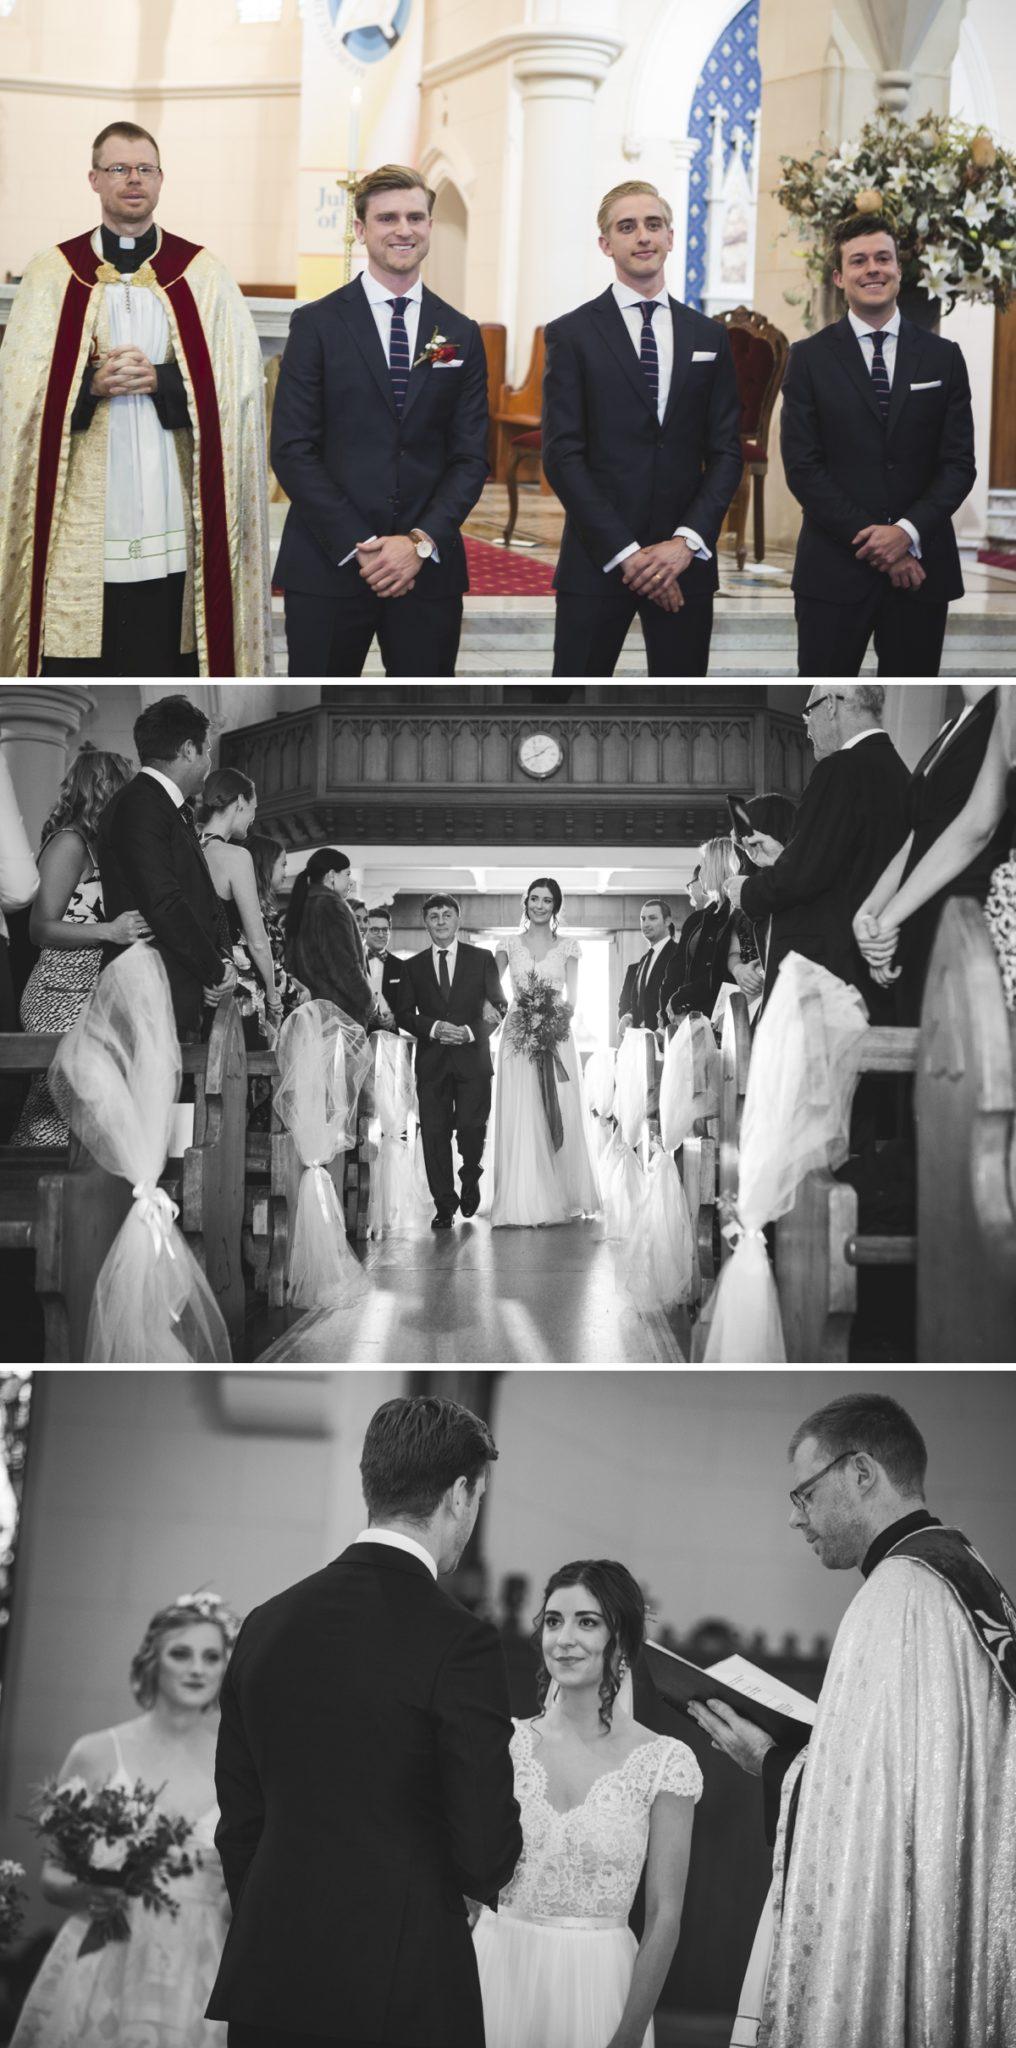 Wagga Wagga Wedding Photographer at Borambola Winery Wagga Wagga Albury wedding photographer Culcairn wedding venue_1183